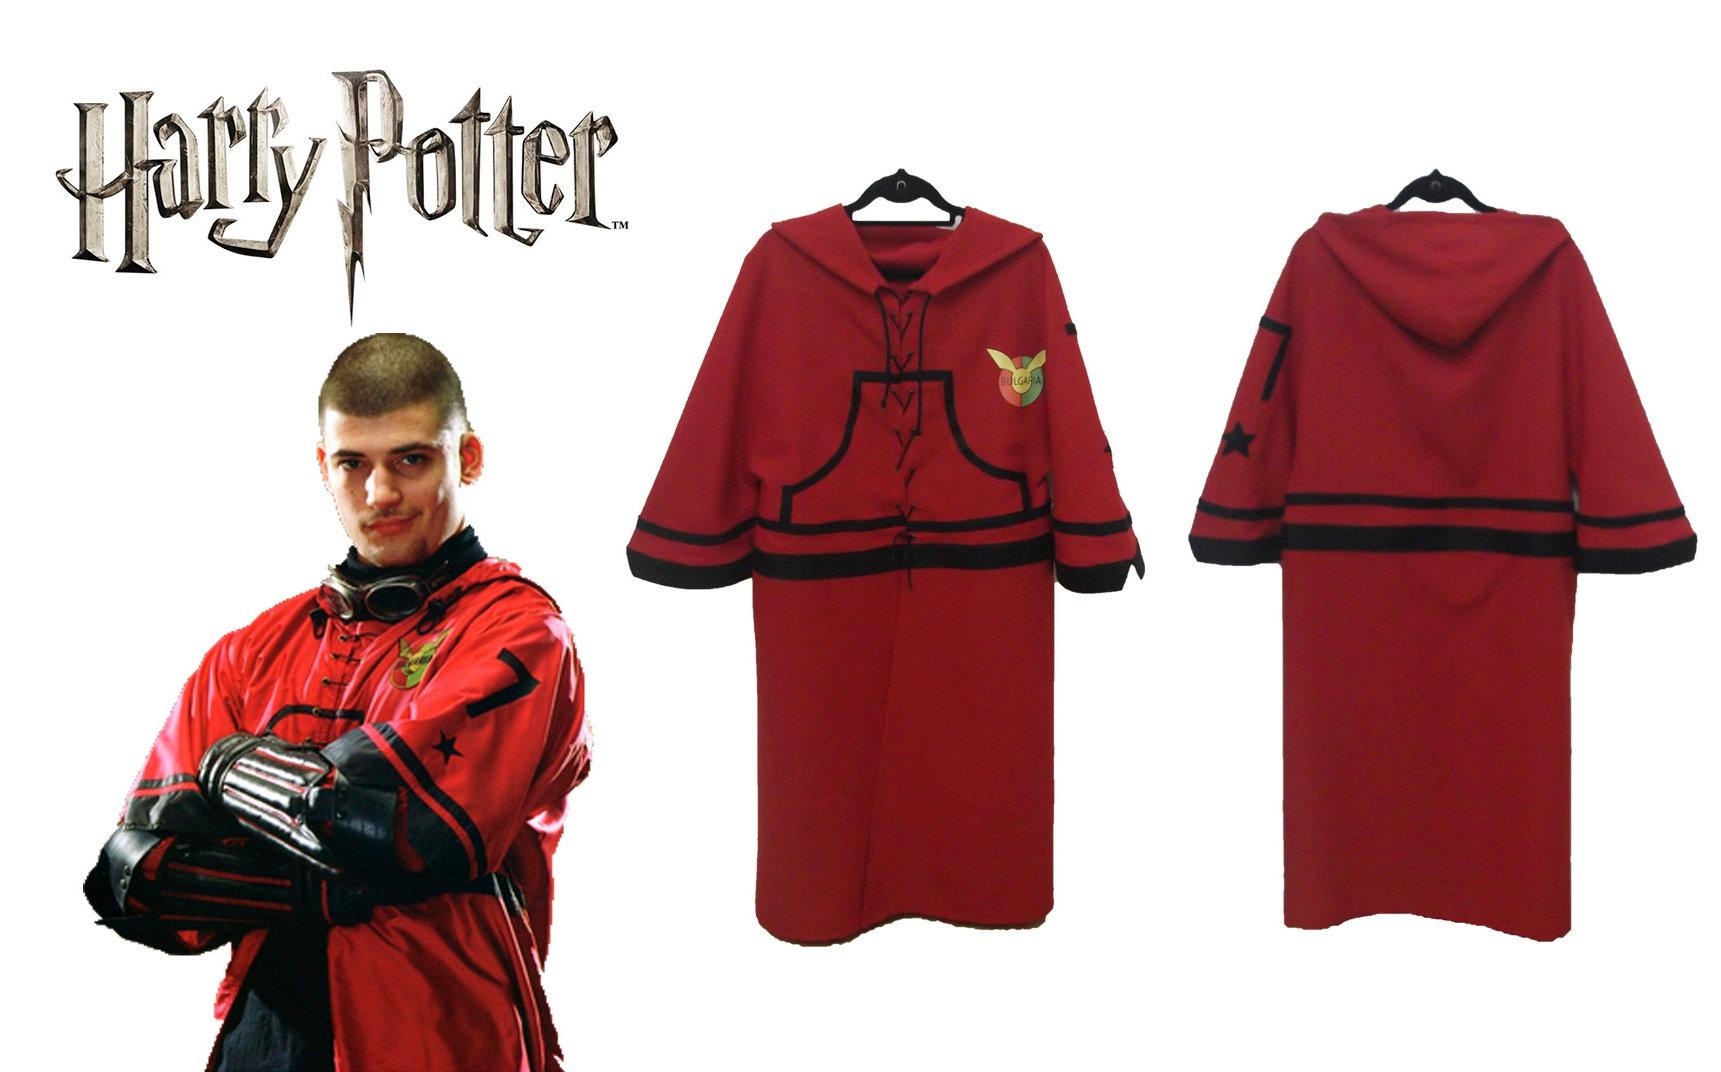 Harry Potter Viktor Krum Quidditch Bulgarian Team Jersey Cosplay Altercos Errors post in comment section or on discord. harry potter viktor krum quidditch bulgarian team jersey cosplay altercos